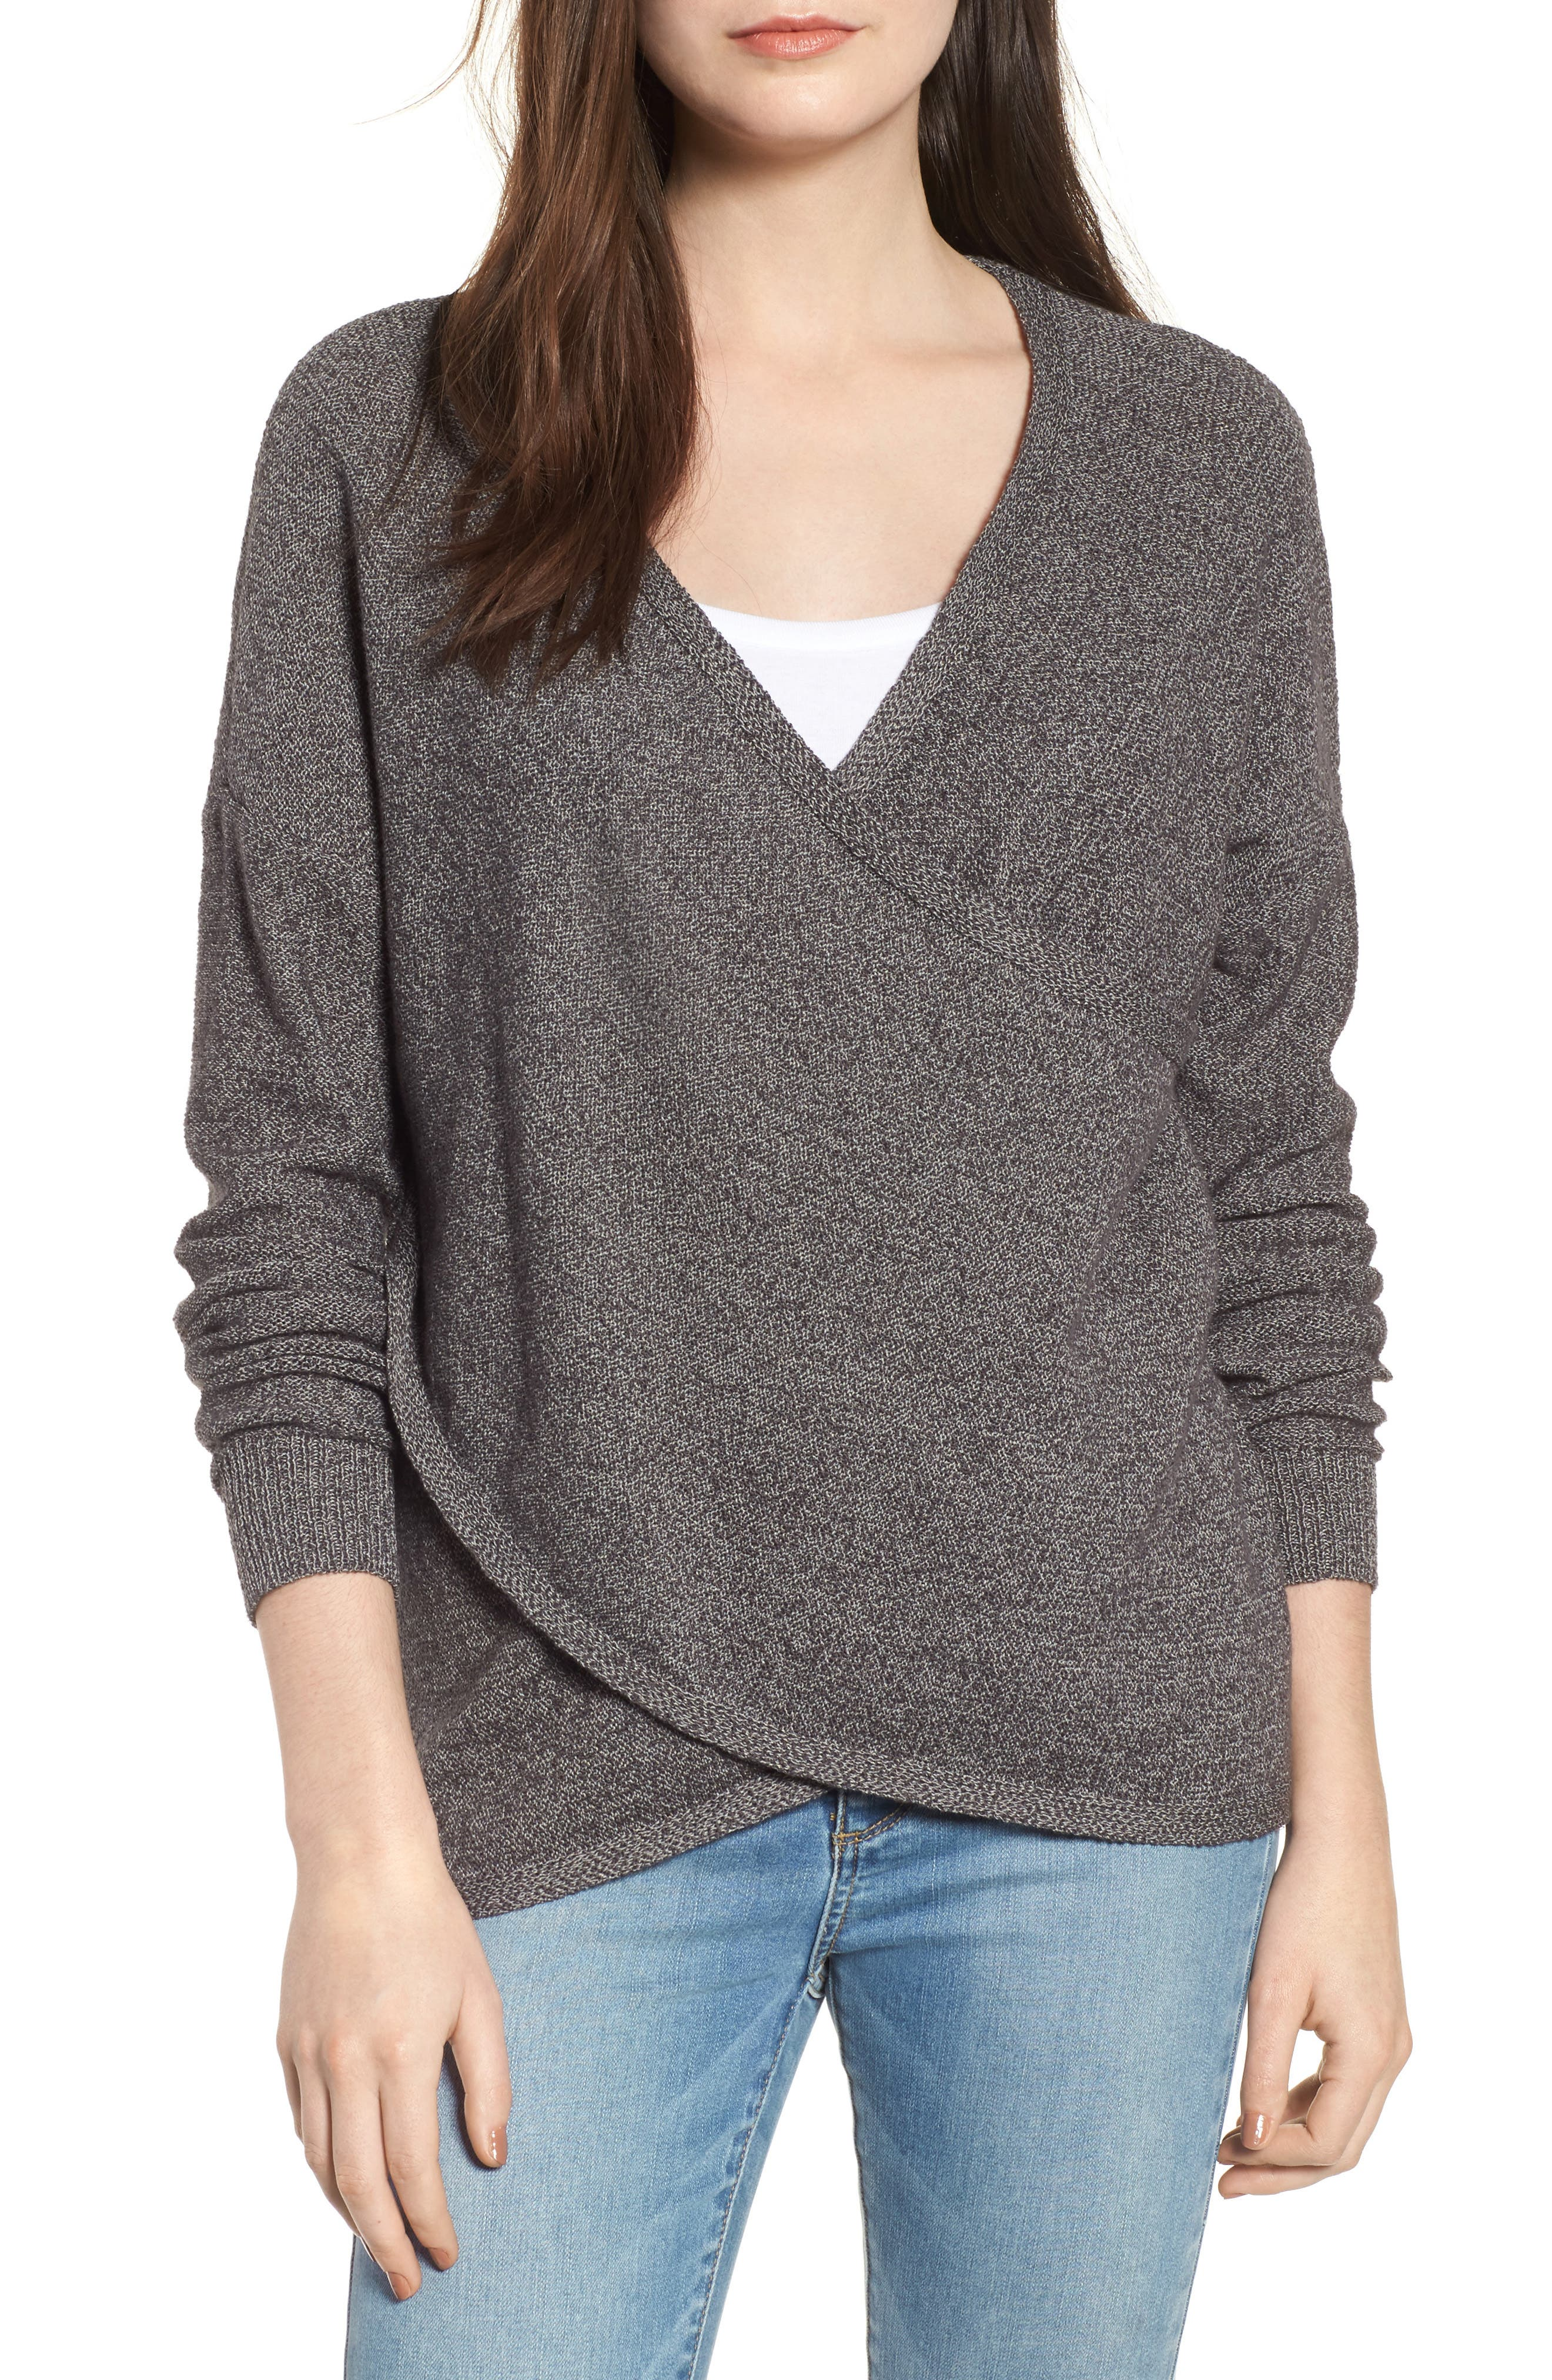 Lira Clothing Lunar Surplice Sweater